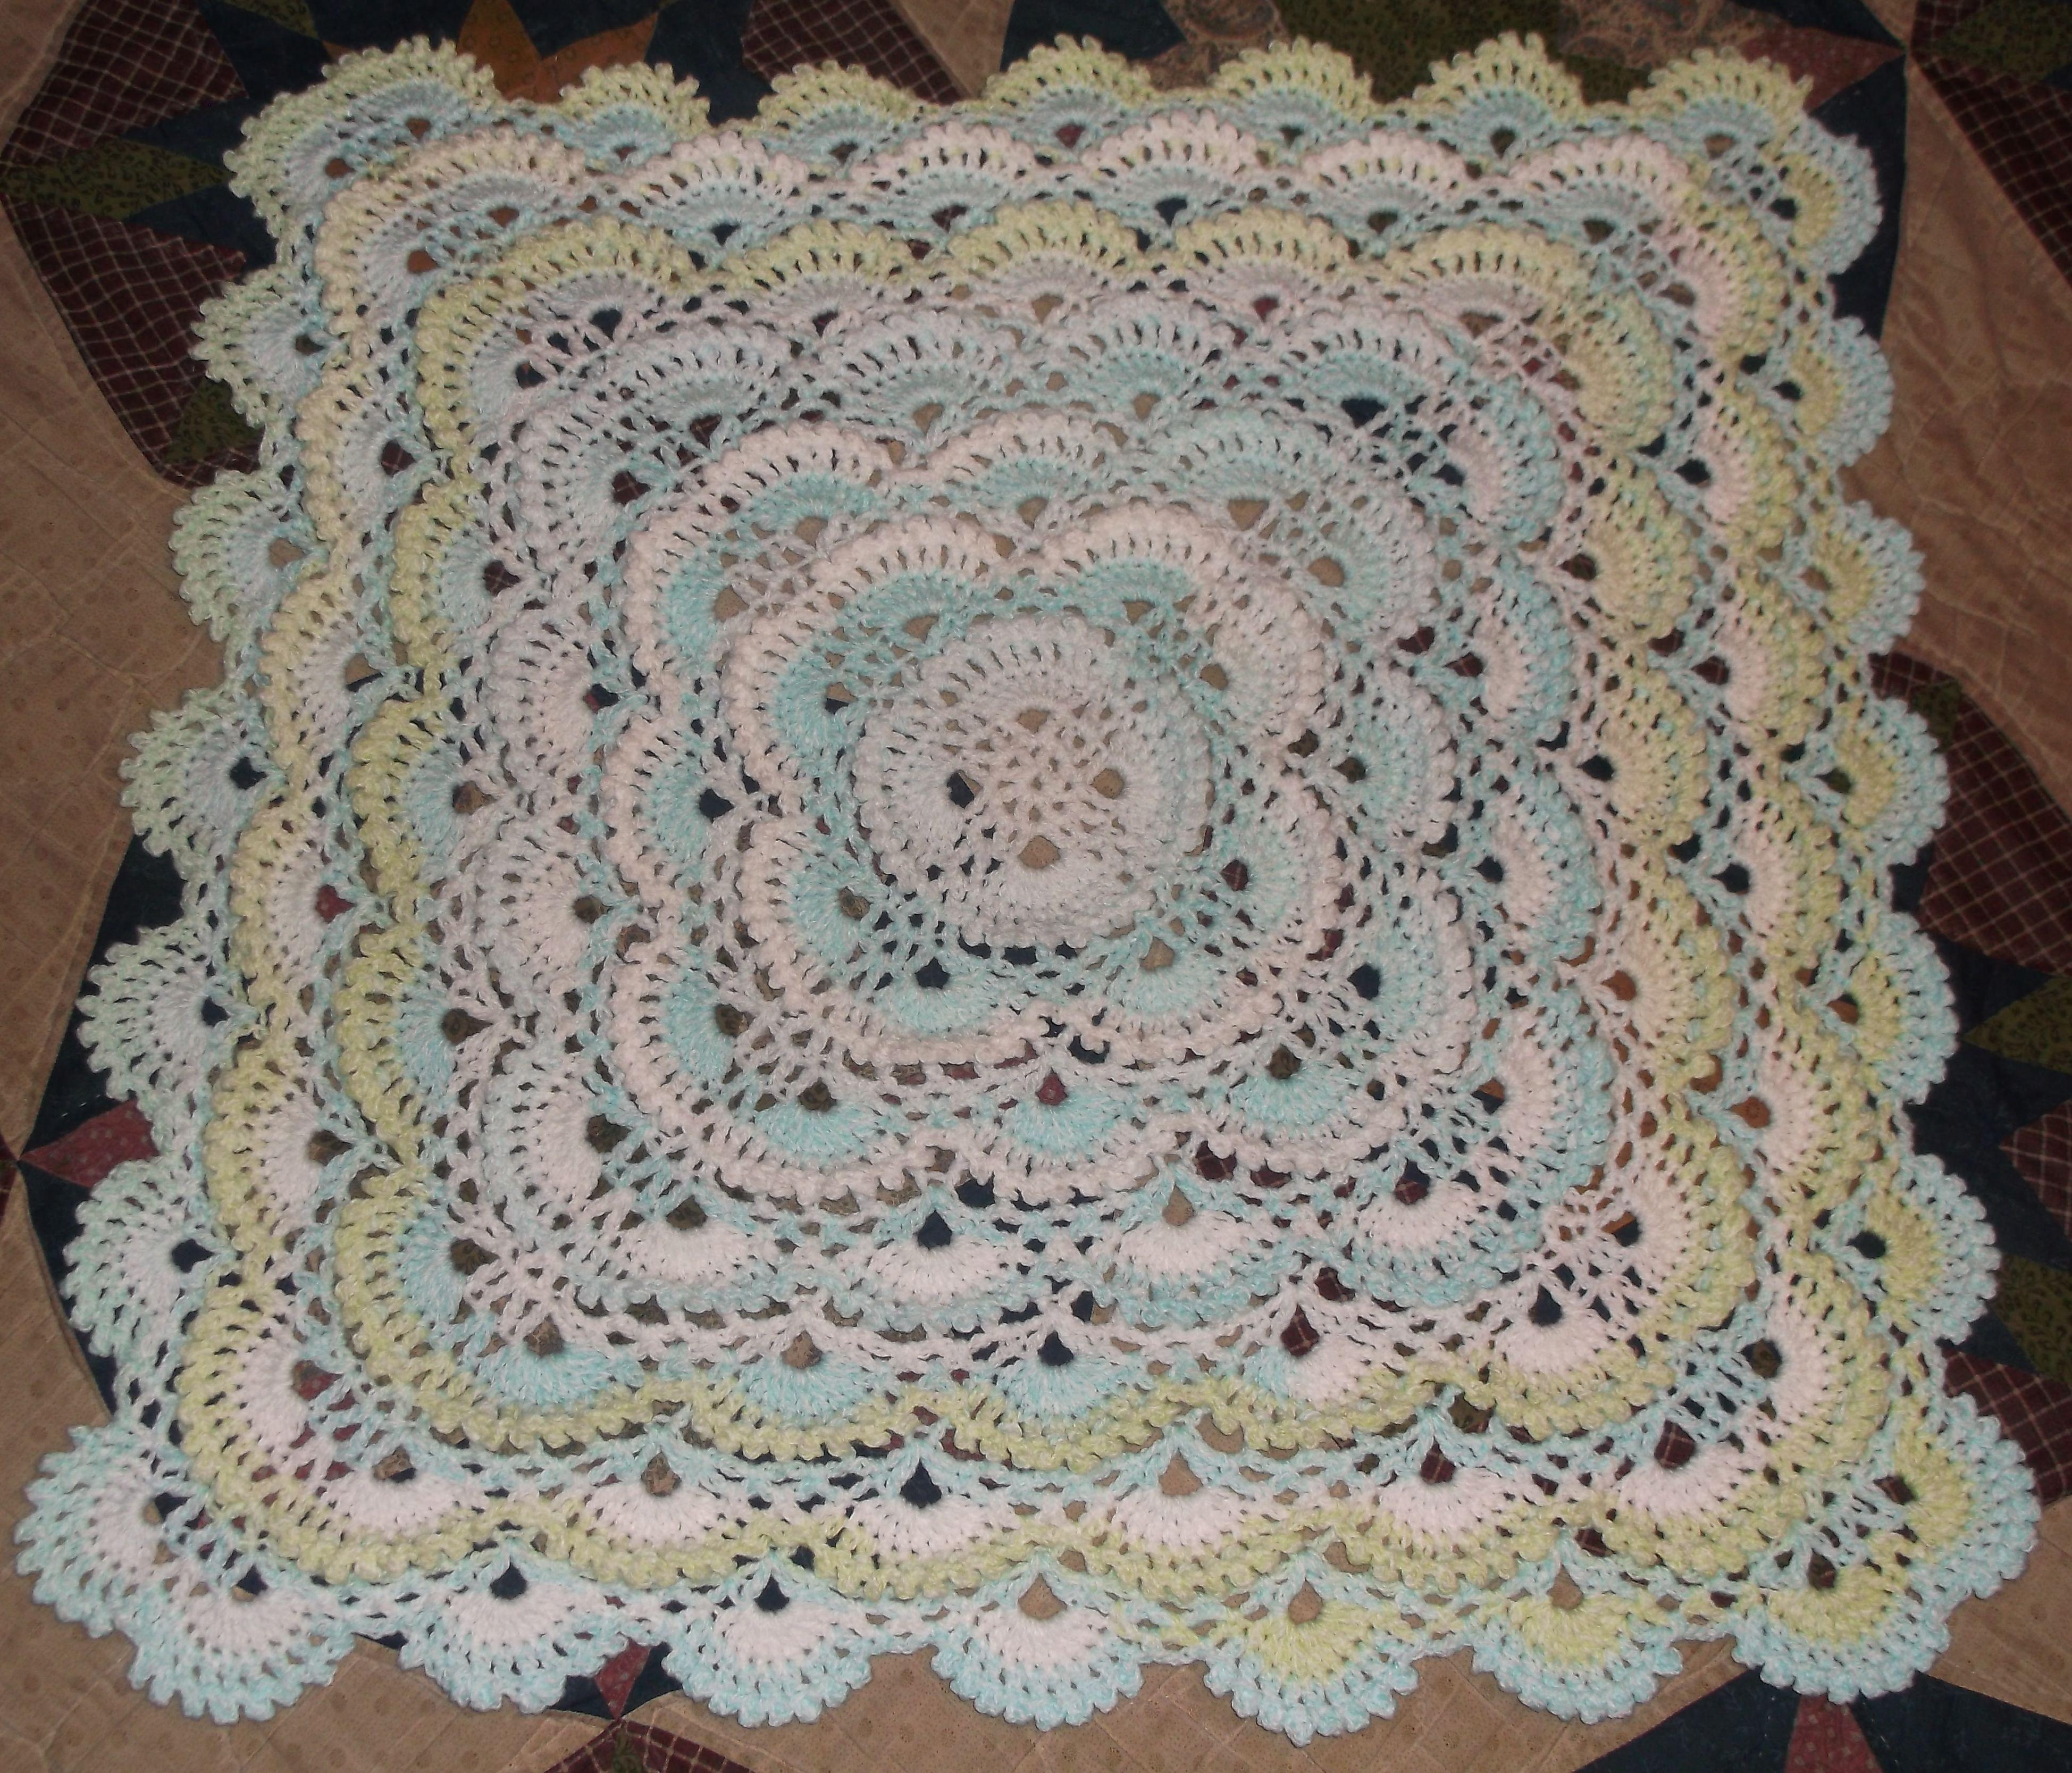 Fluffy meringue stitch crochet blanket afghan baby httpwww fluffy meringue stitch crochet blanket afghan baby httpyarnspirations bankloansurffo Image collections